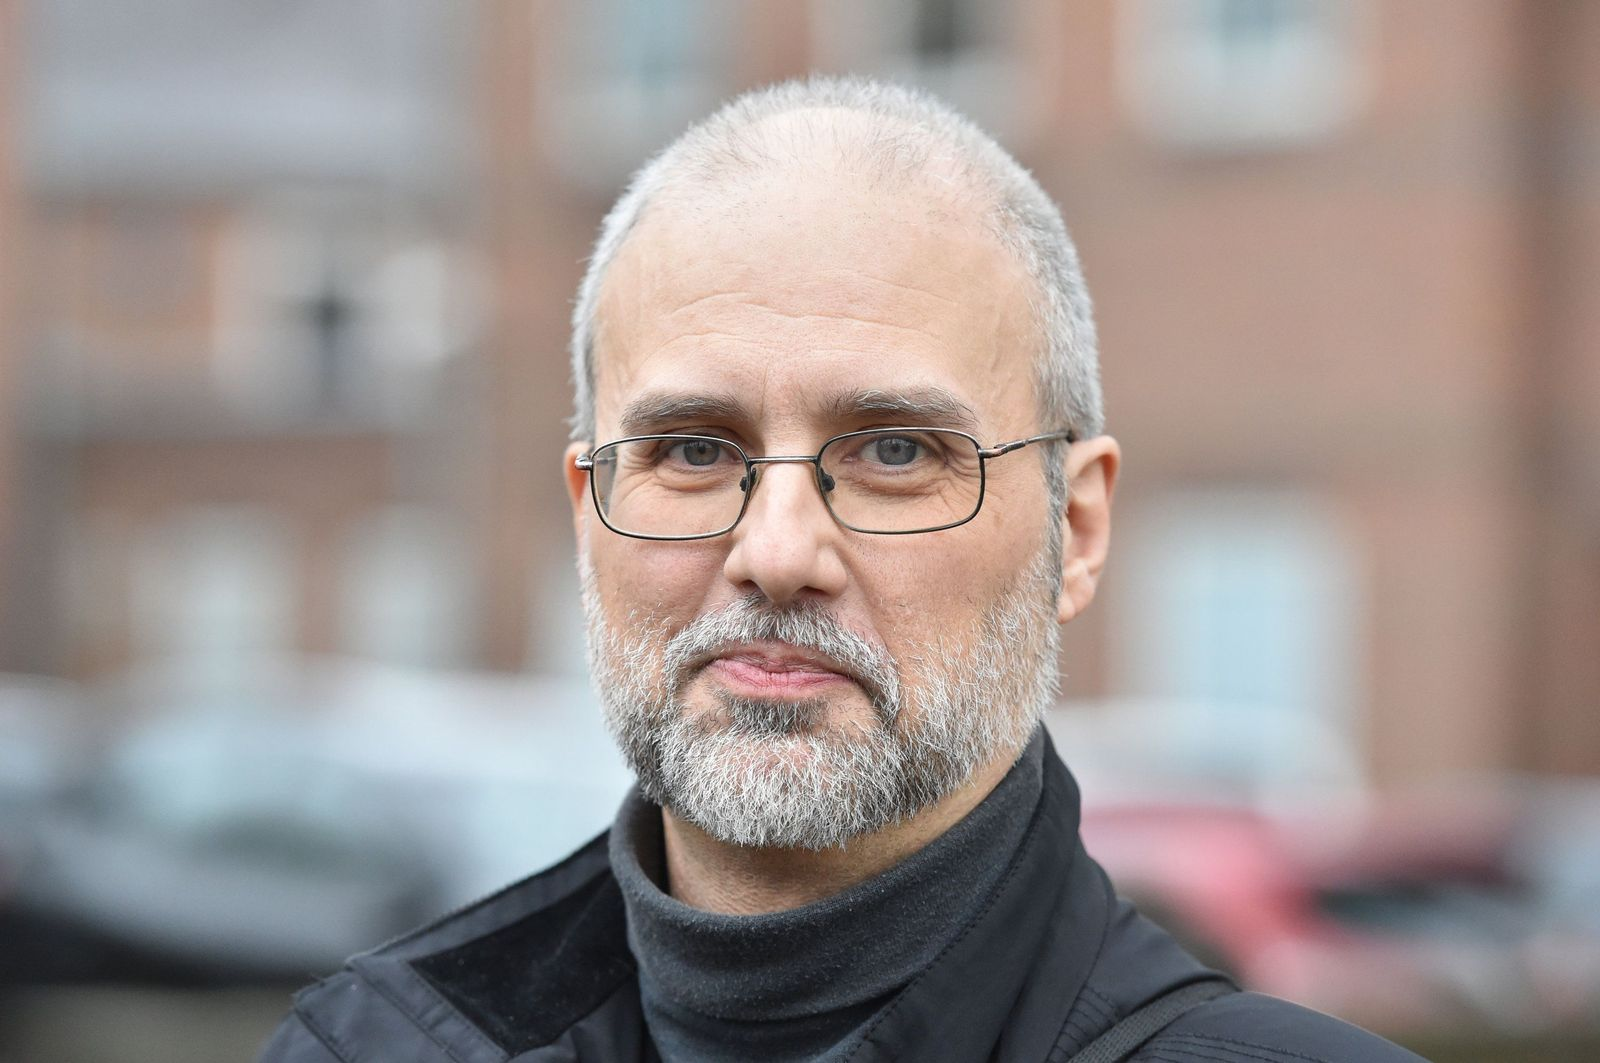 Jordi Casamitjana/ Veganismus/ Weltanschauung